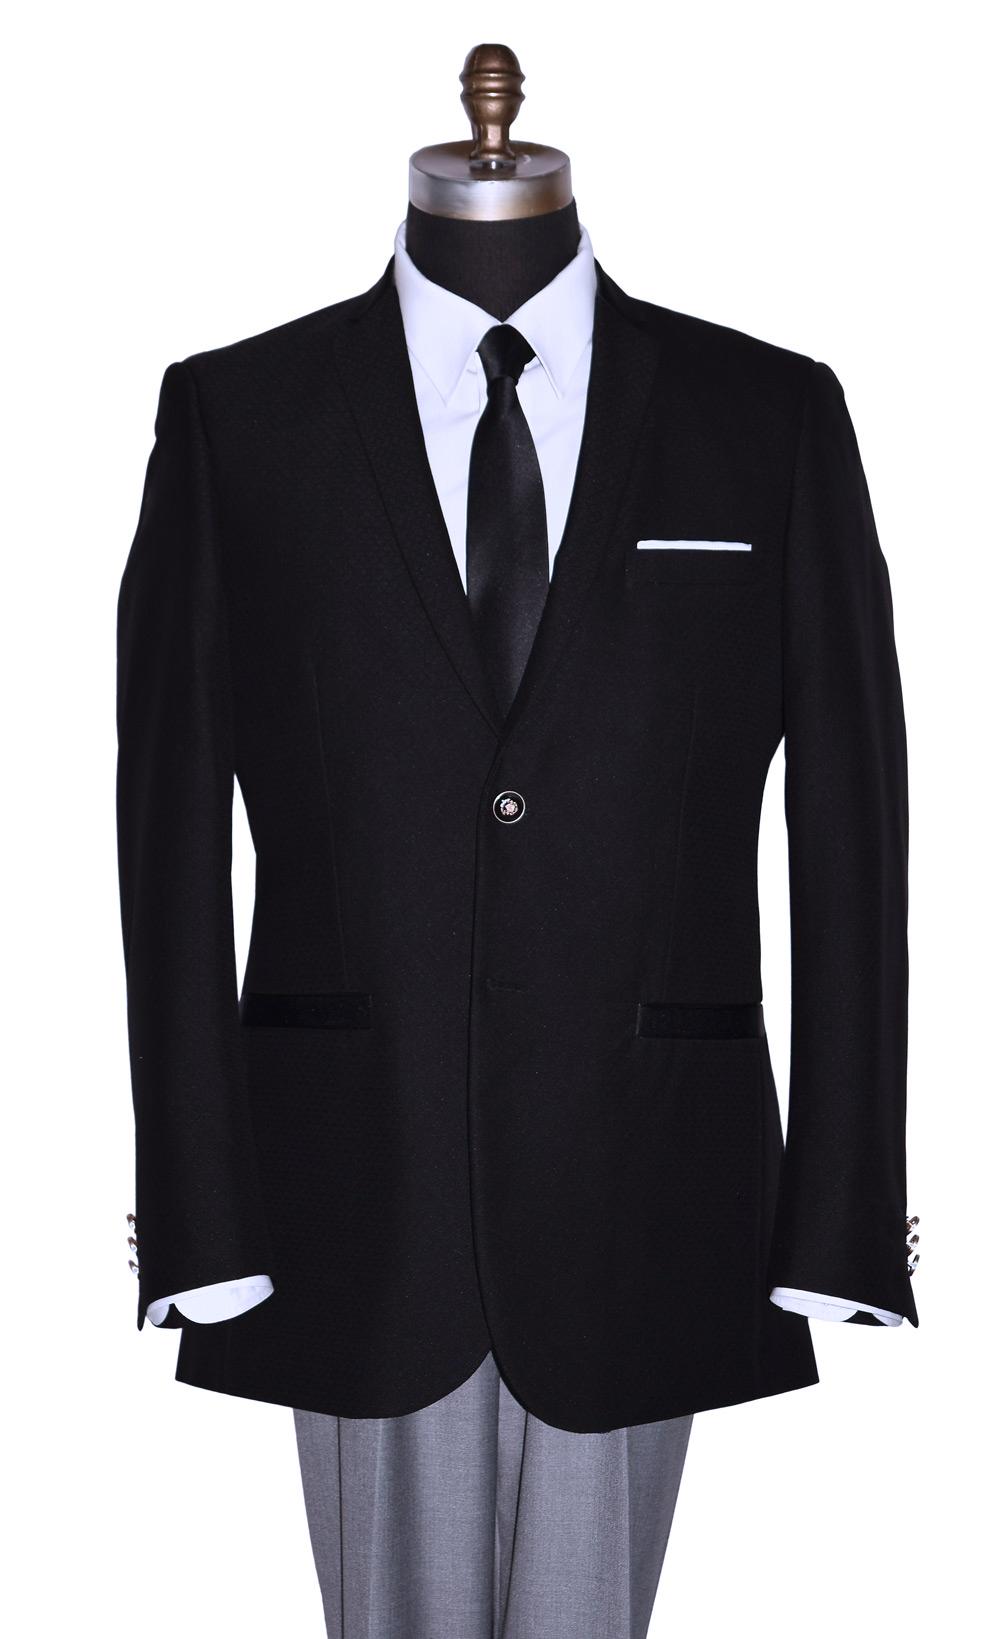 Black Sports Coat With Subtle Texture